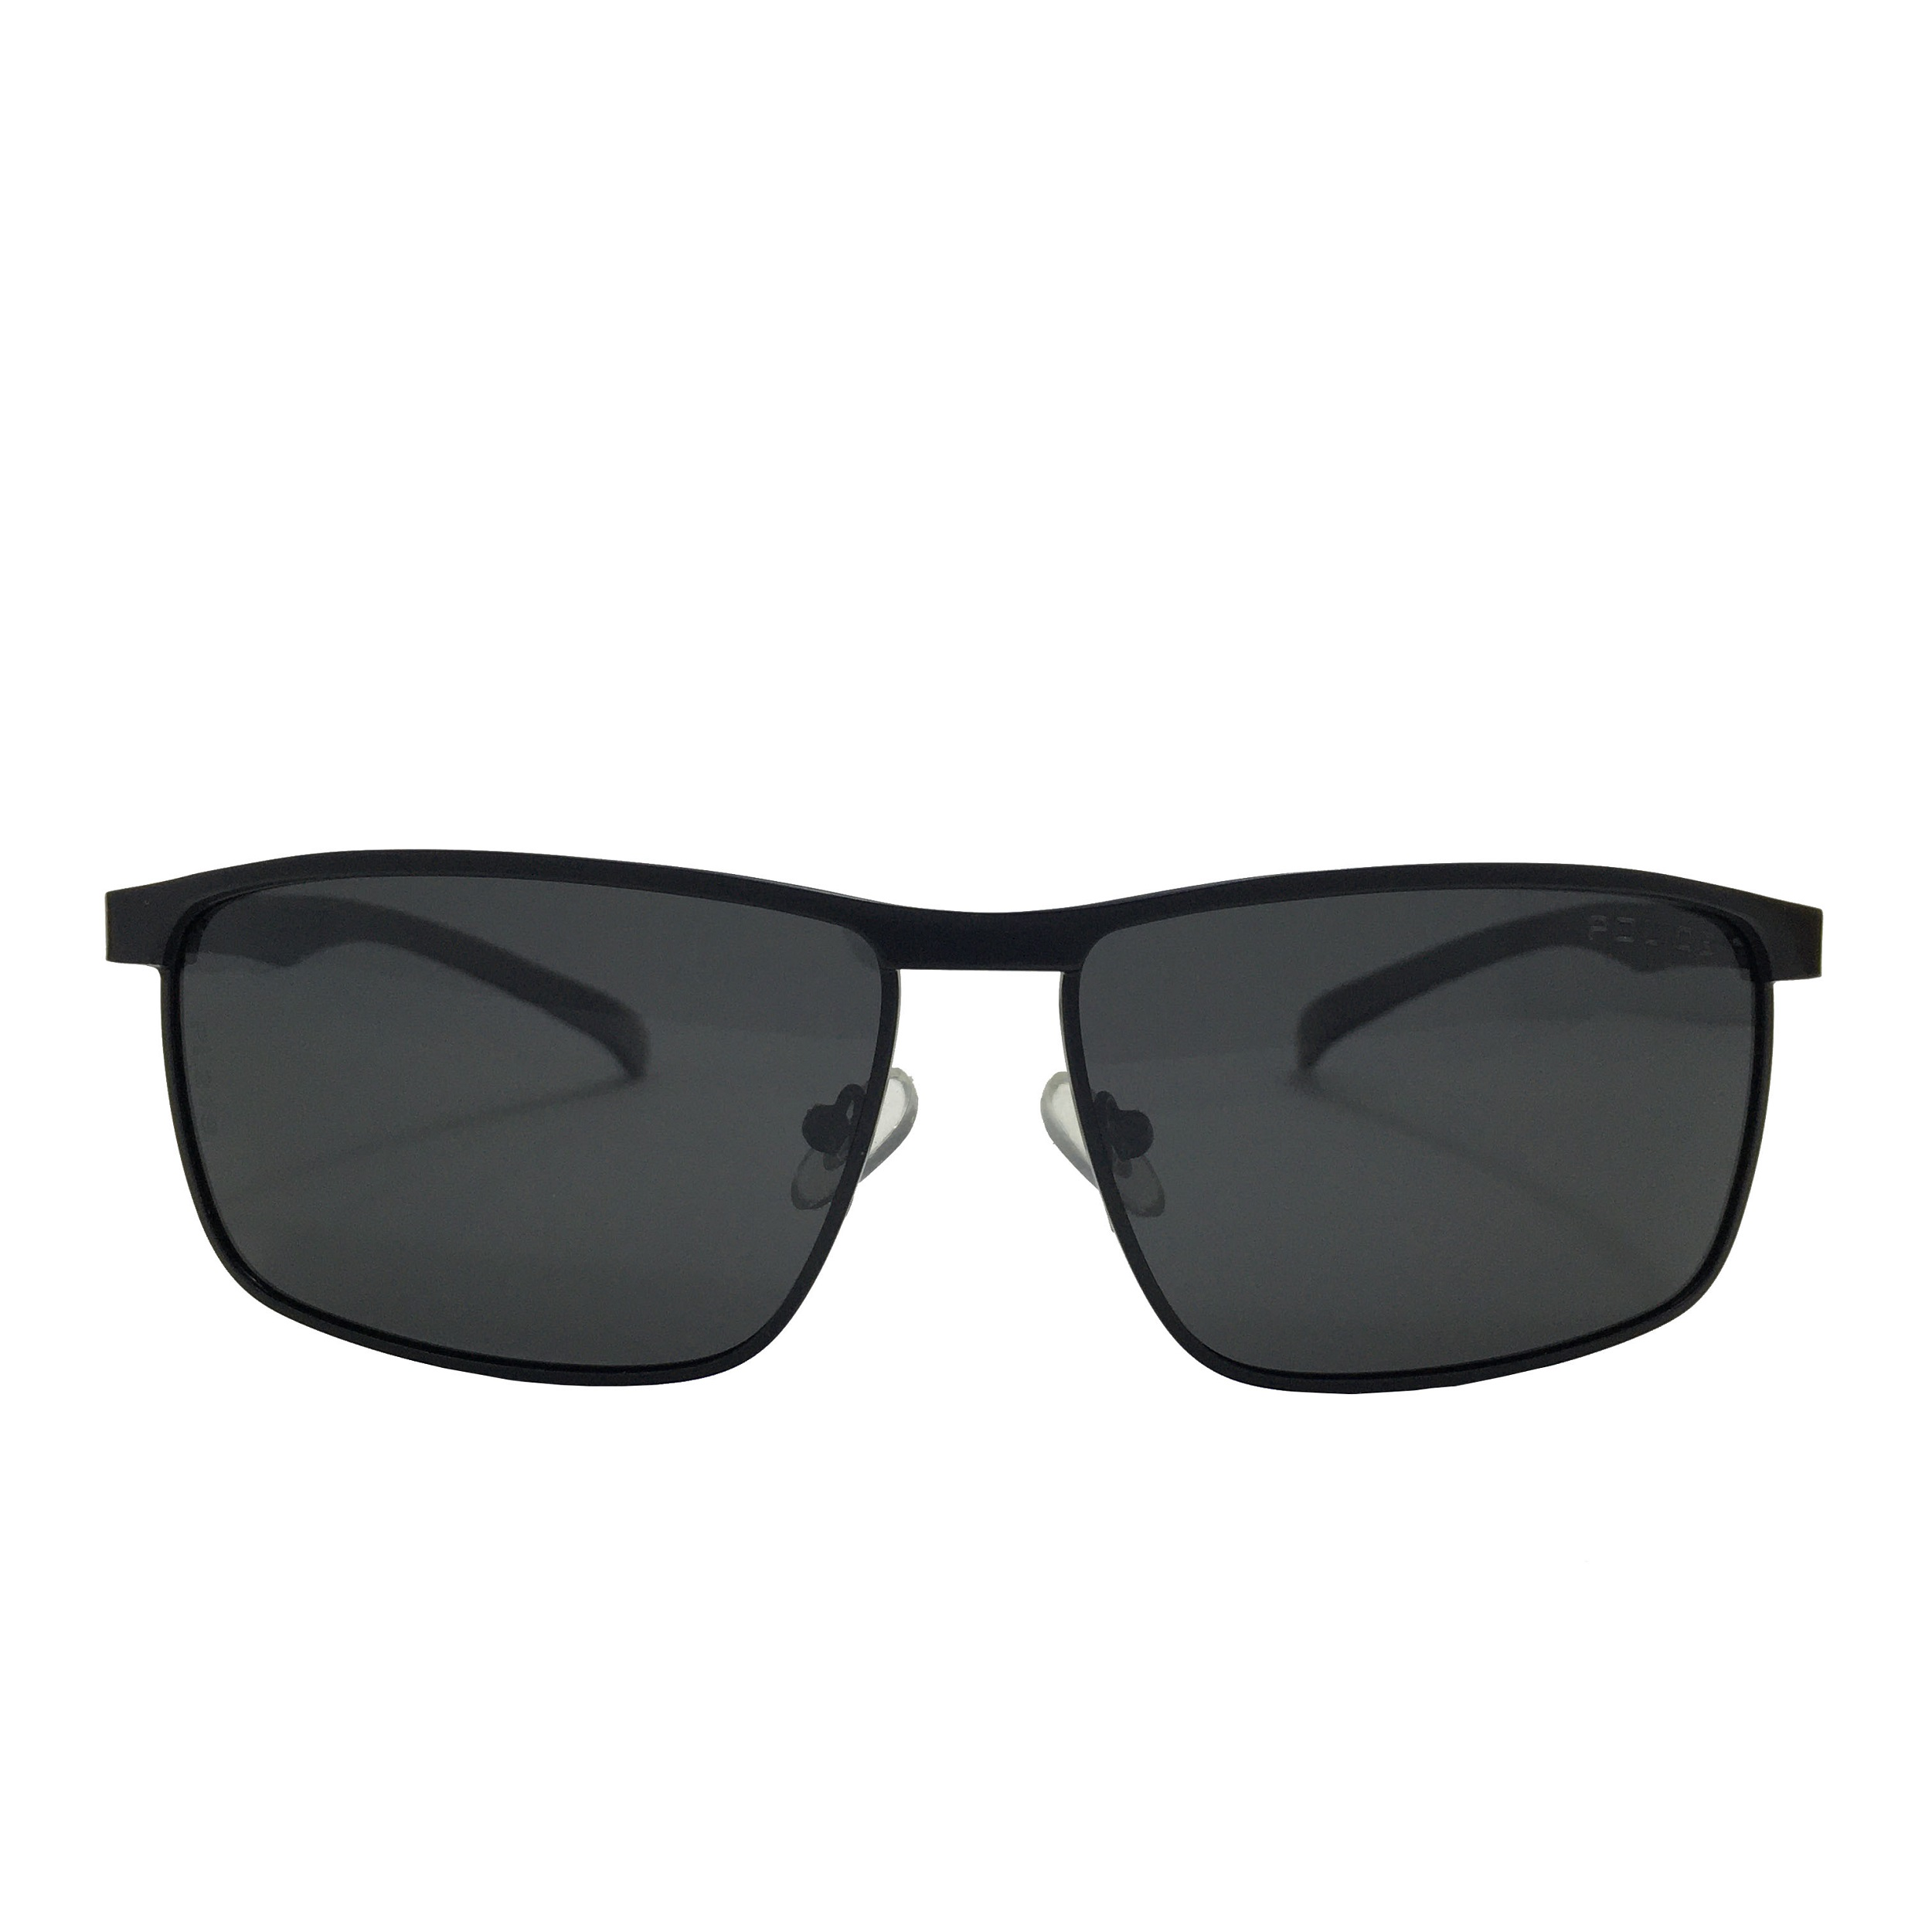 عینک آفتابی مردانه پلیس مدل 219